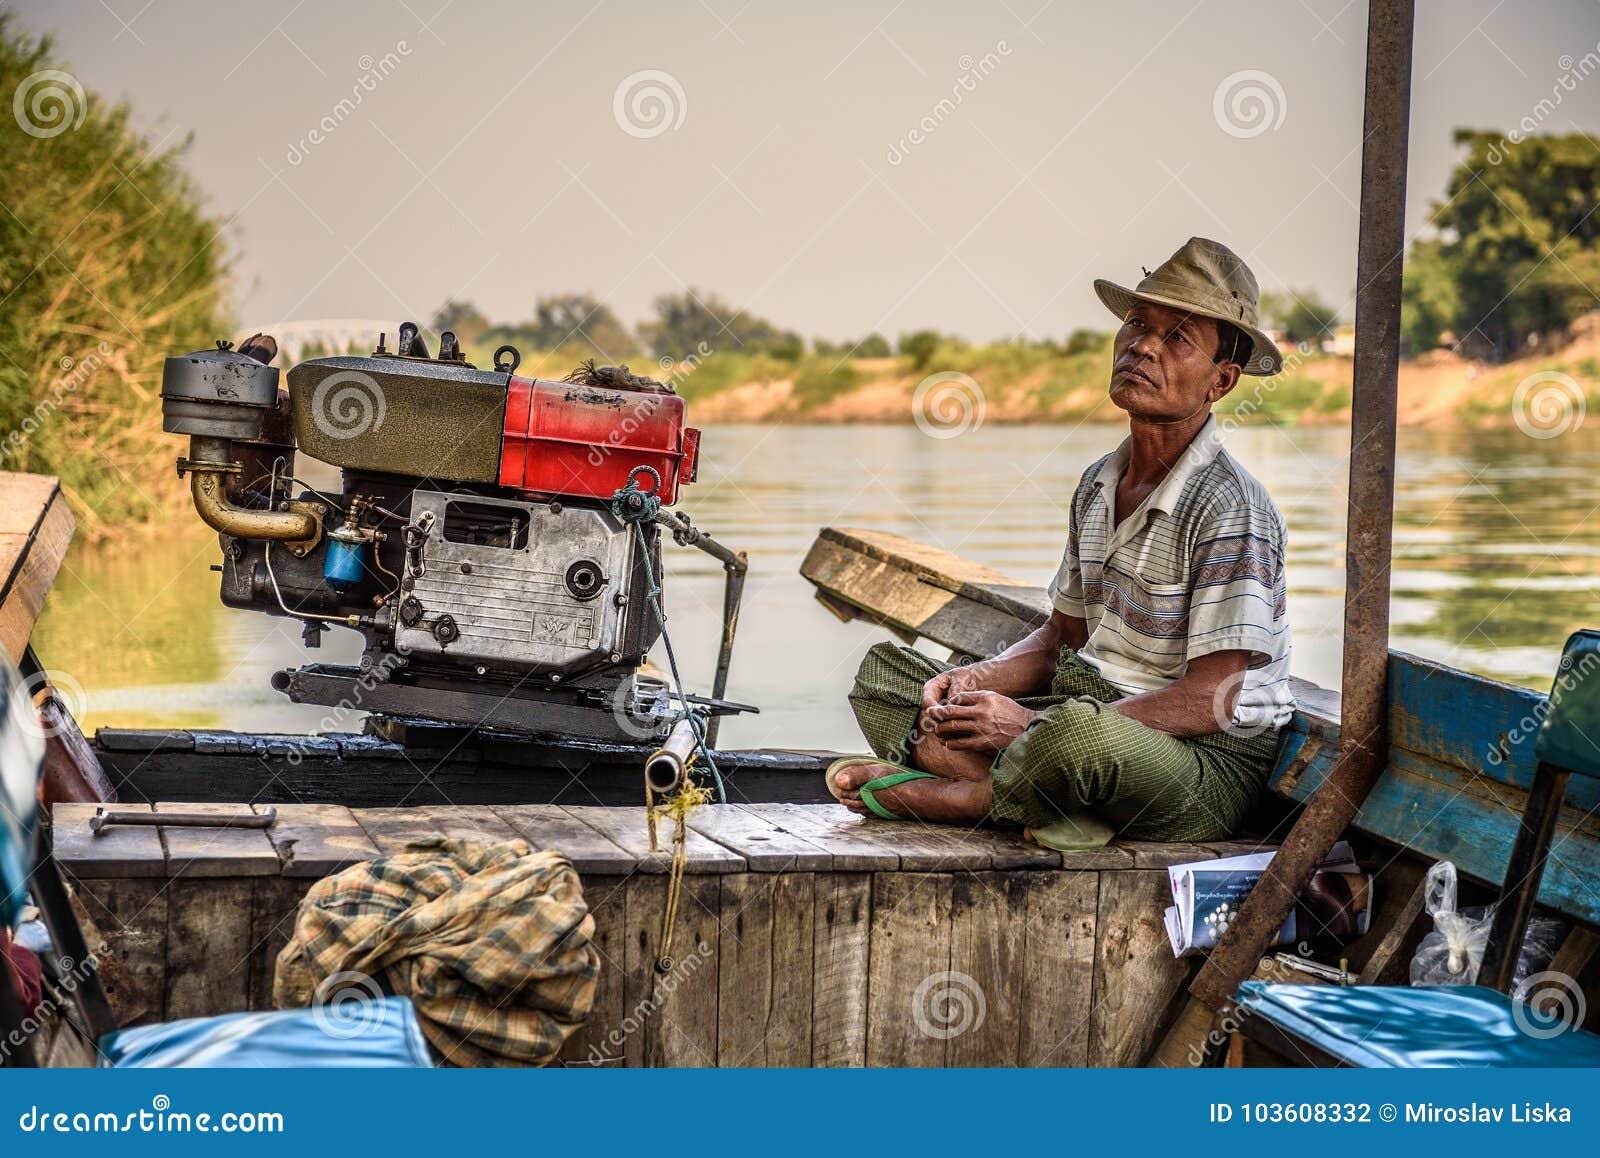 Burmese man controls a boat for travel the Mu River